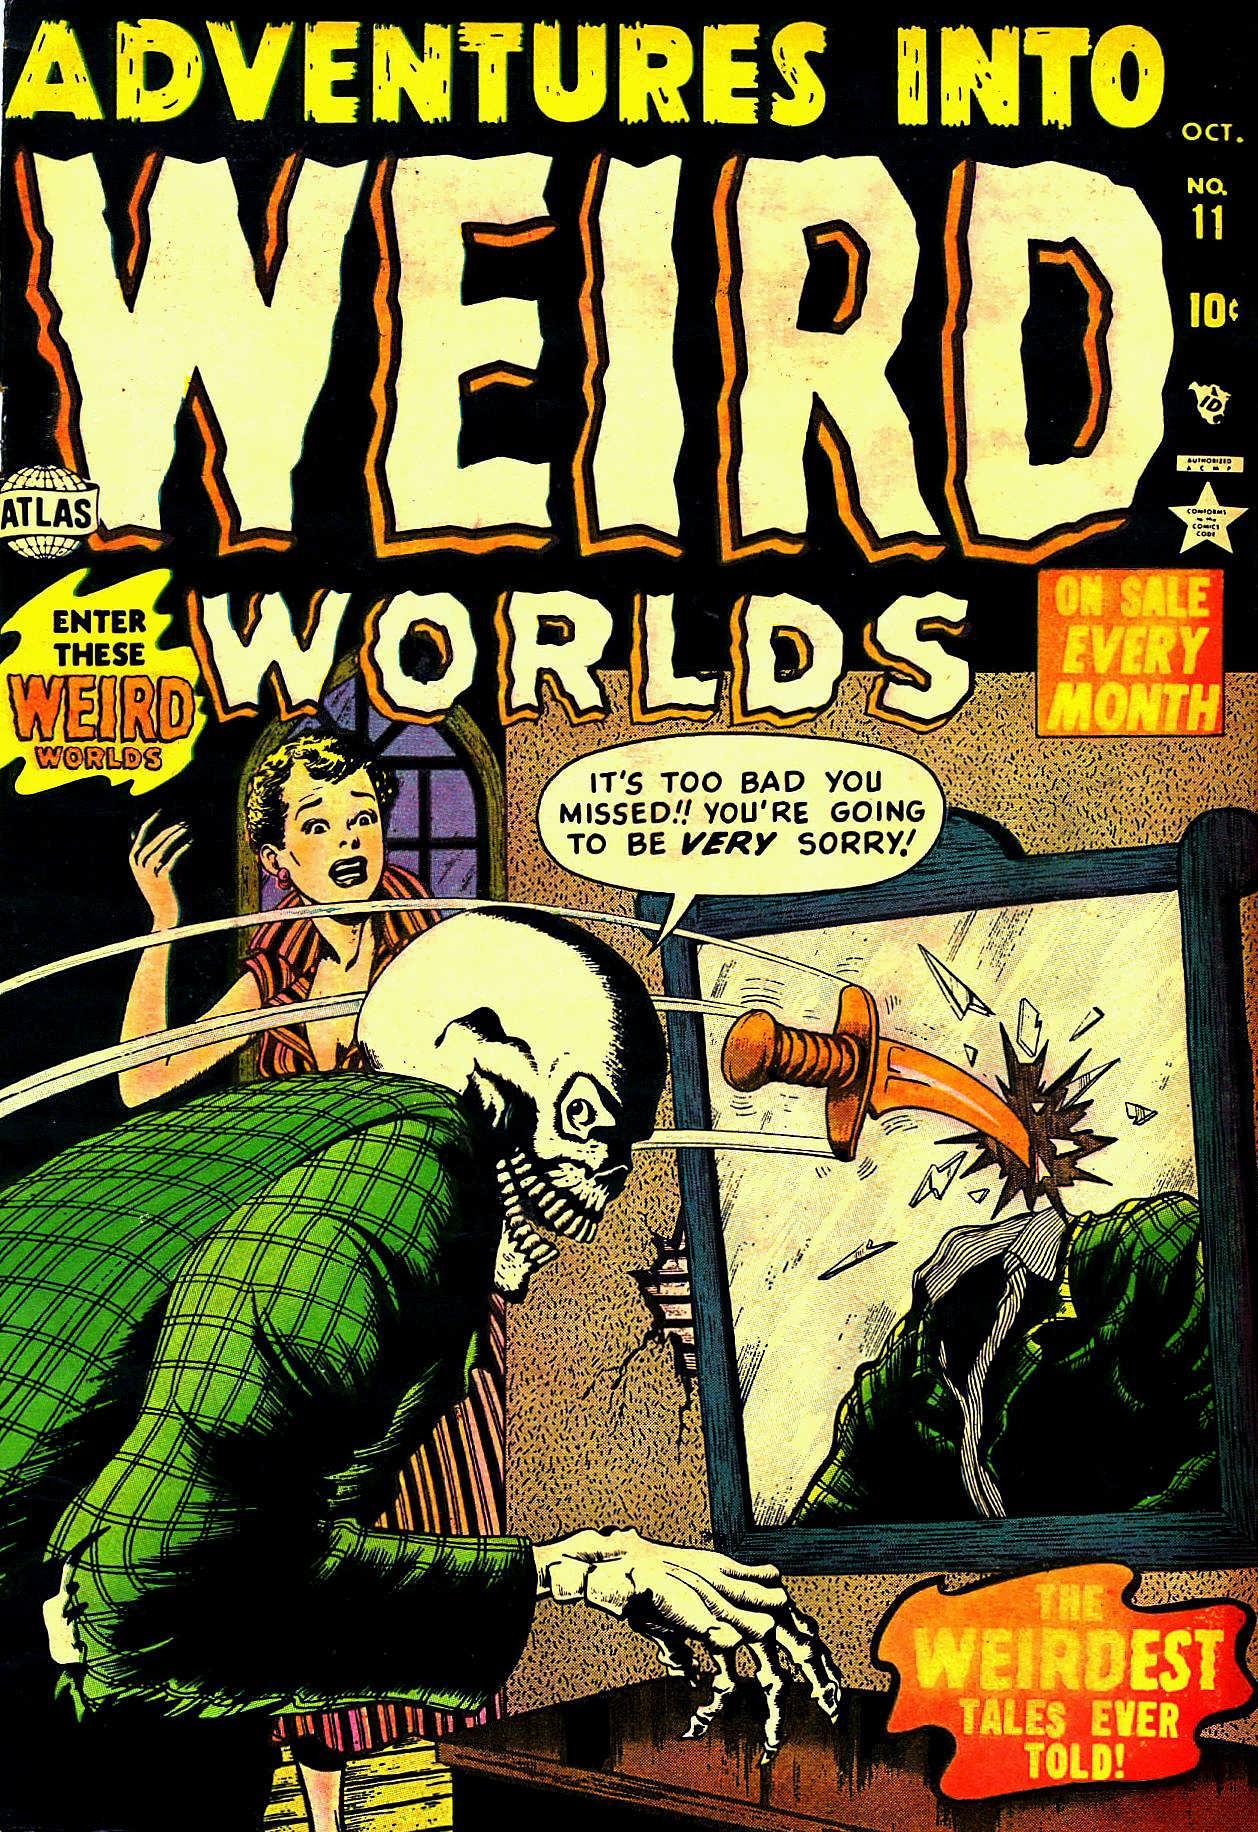 Adventures into Weird Worlds 11 Page 1